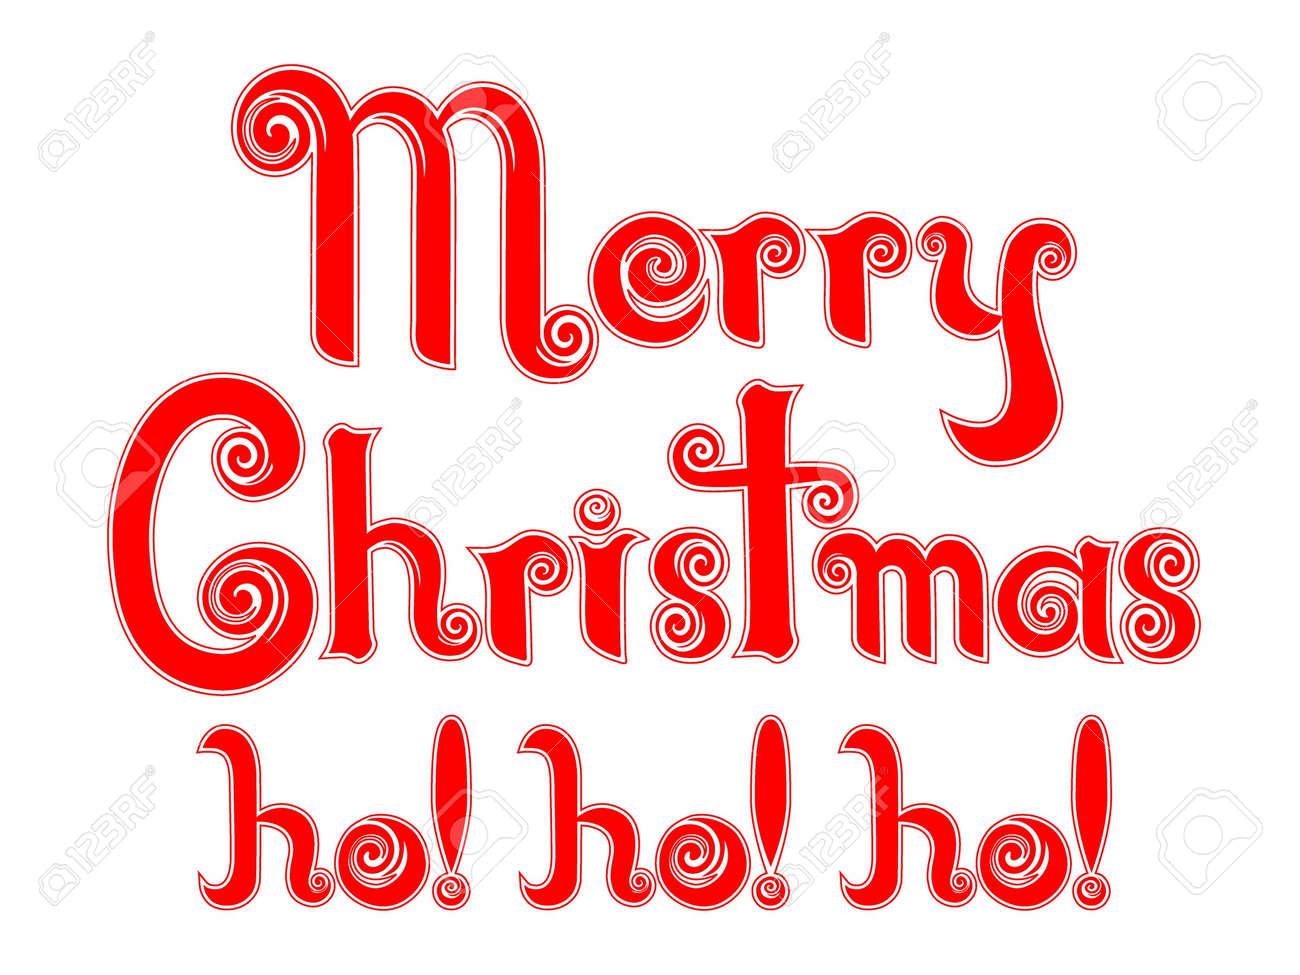 Merry Christmas Ho! Ho! Ho! In An Original Peppermint Candy ...